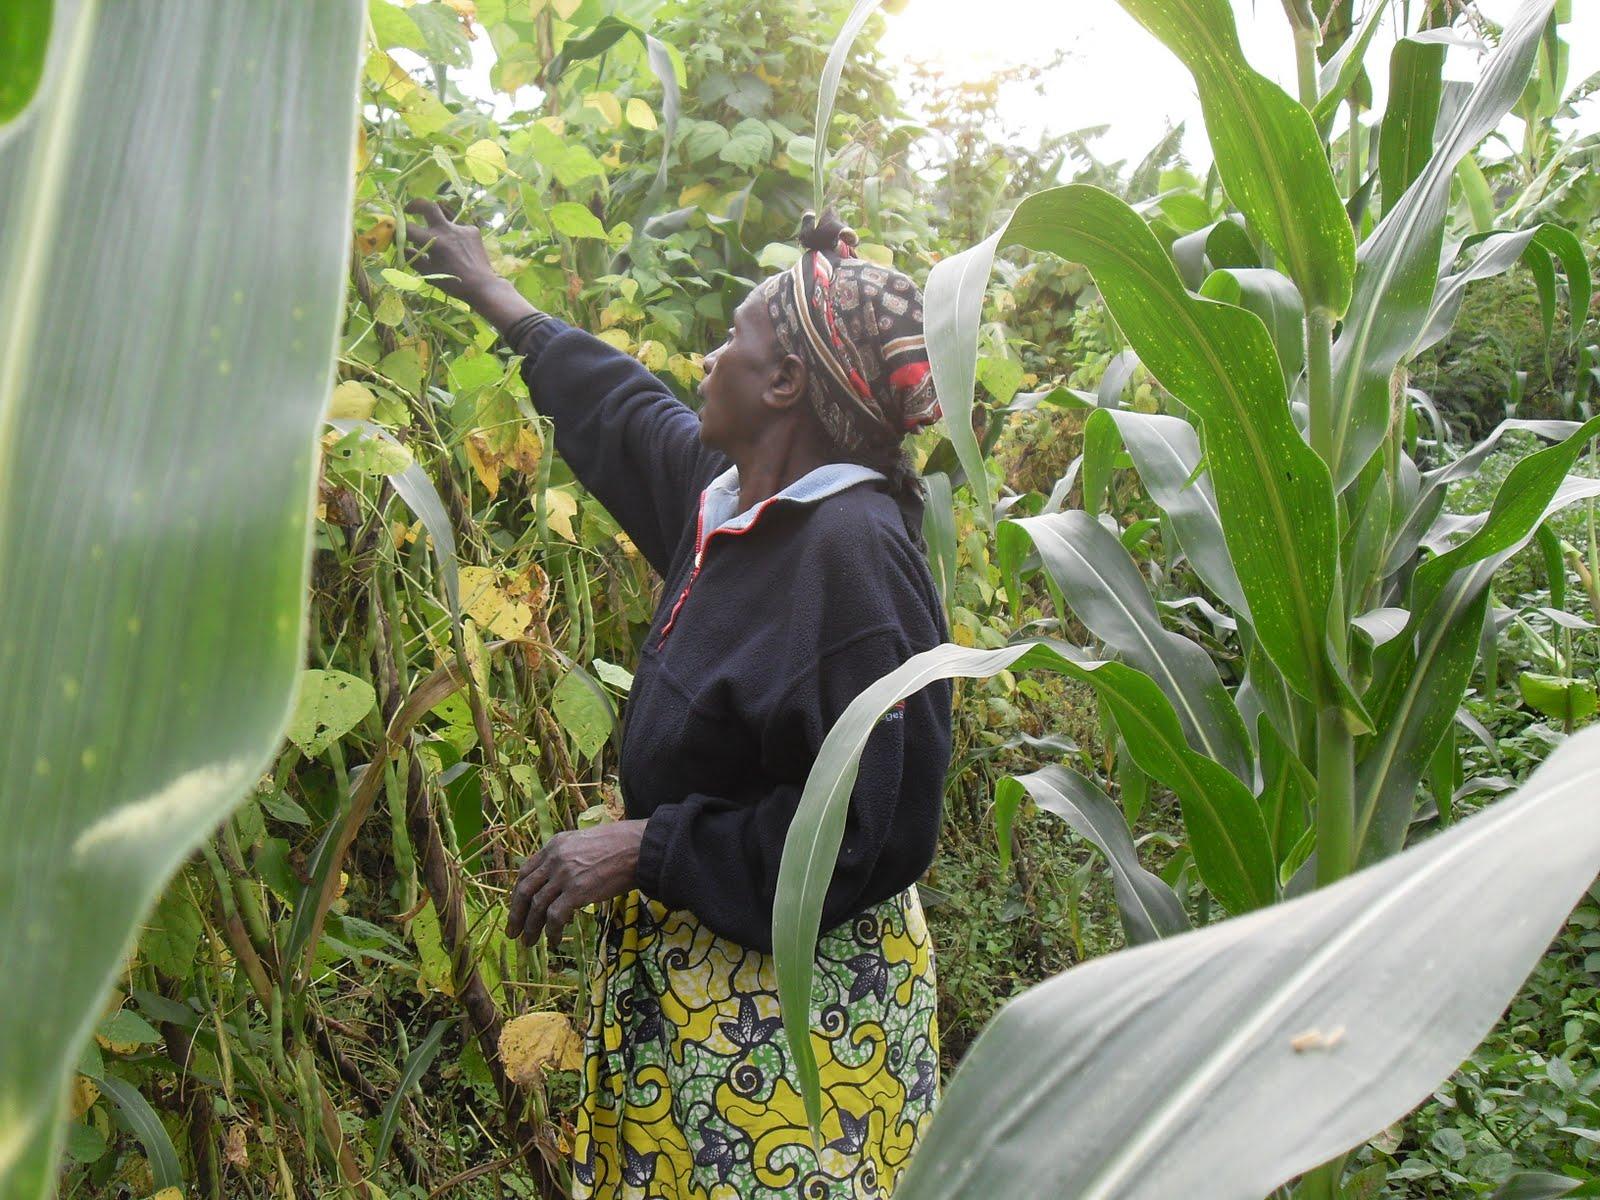 Ochieng' Ogodo online: Climbing beans changing Rwanda's